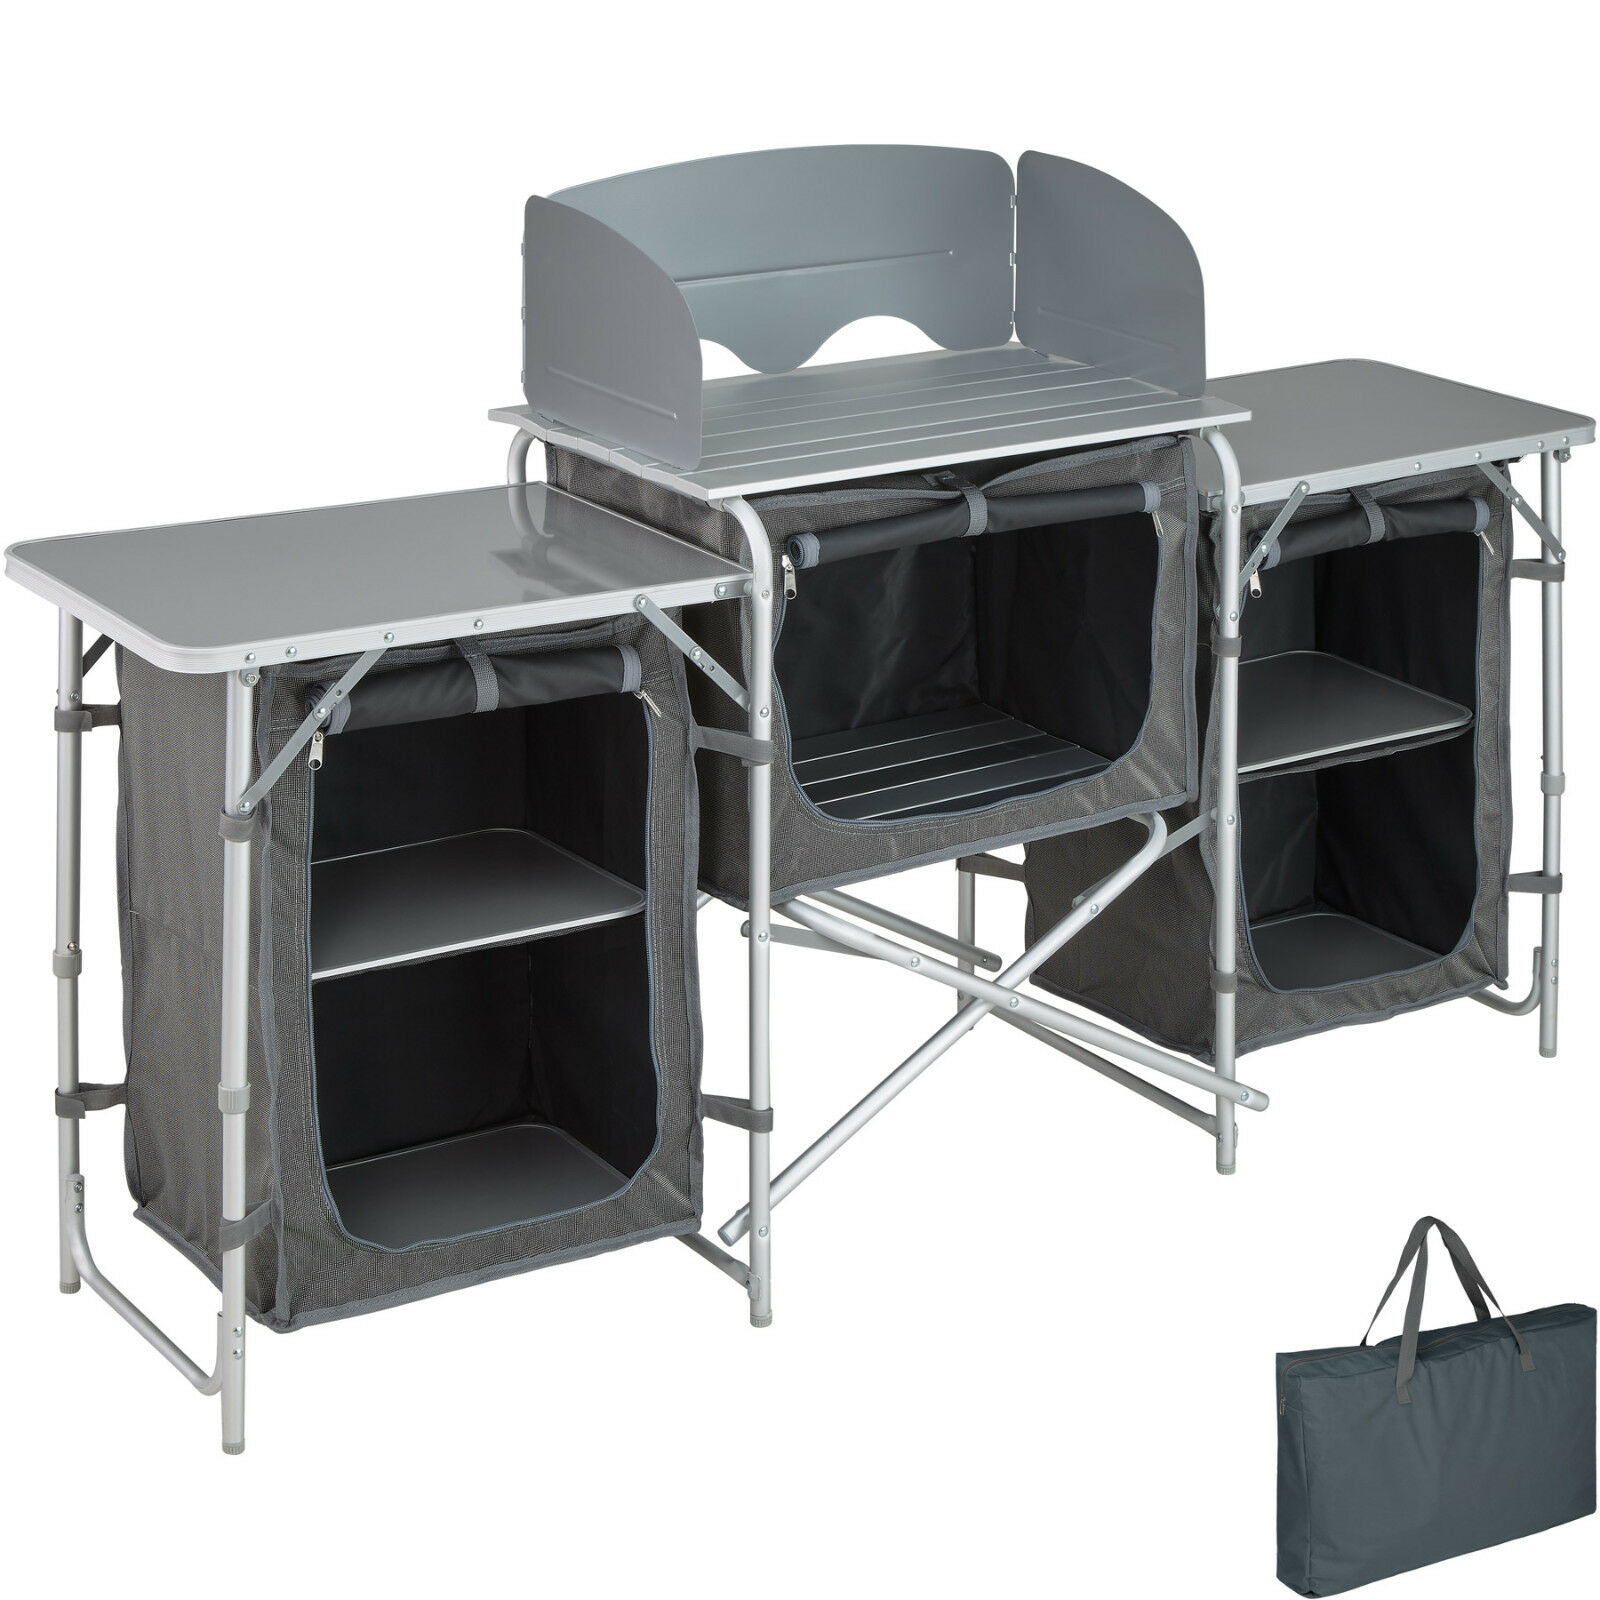 Cocina de camping aluminio küchenbox camping armario plegable plegable cortavientos Outdoor